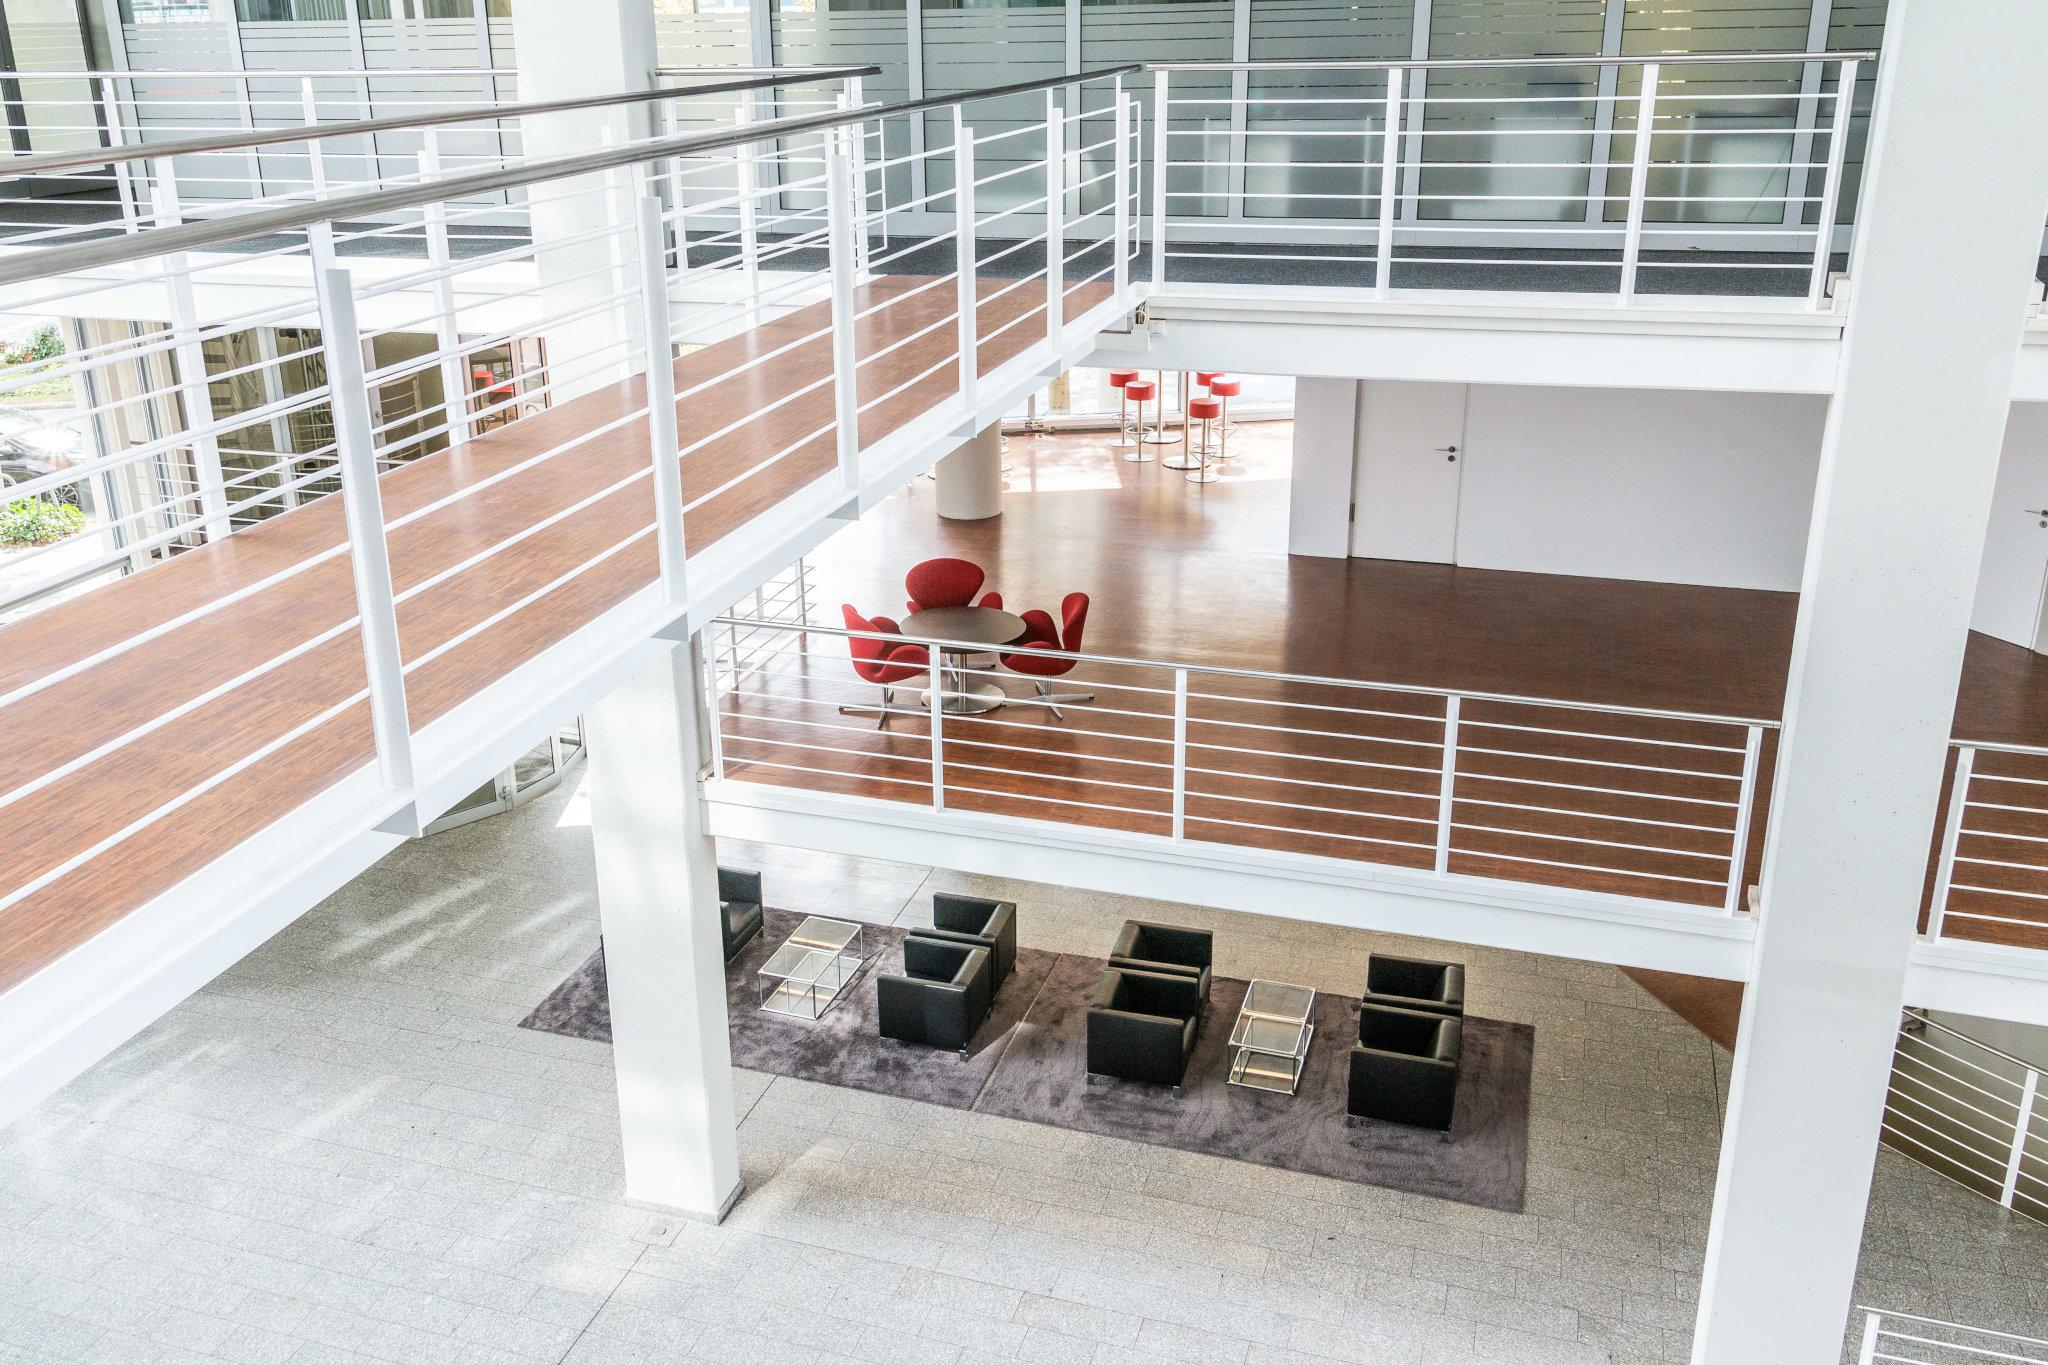 Bild - Standort Dortmund der otris software AG